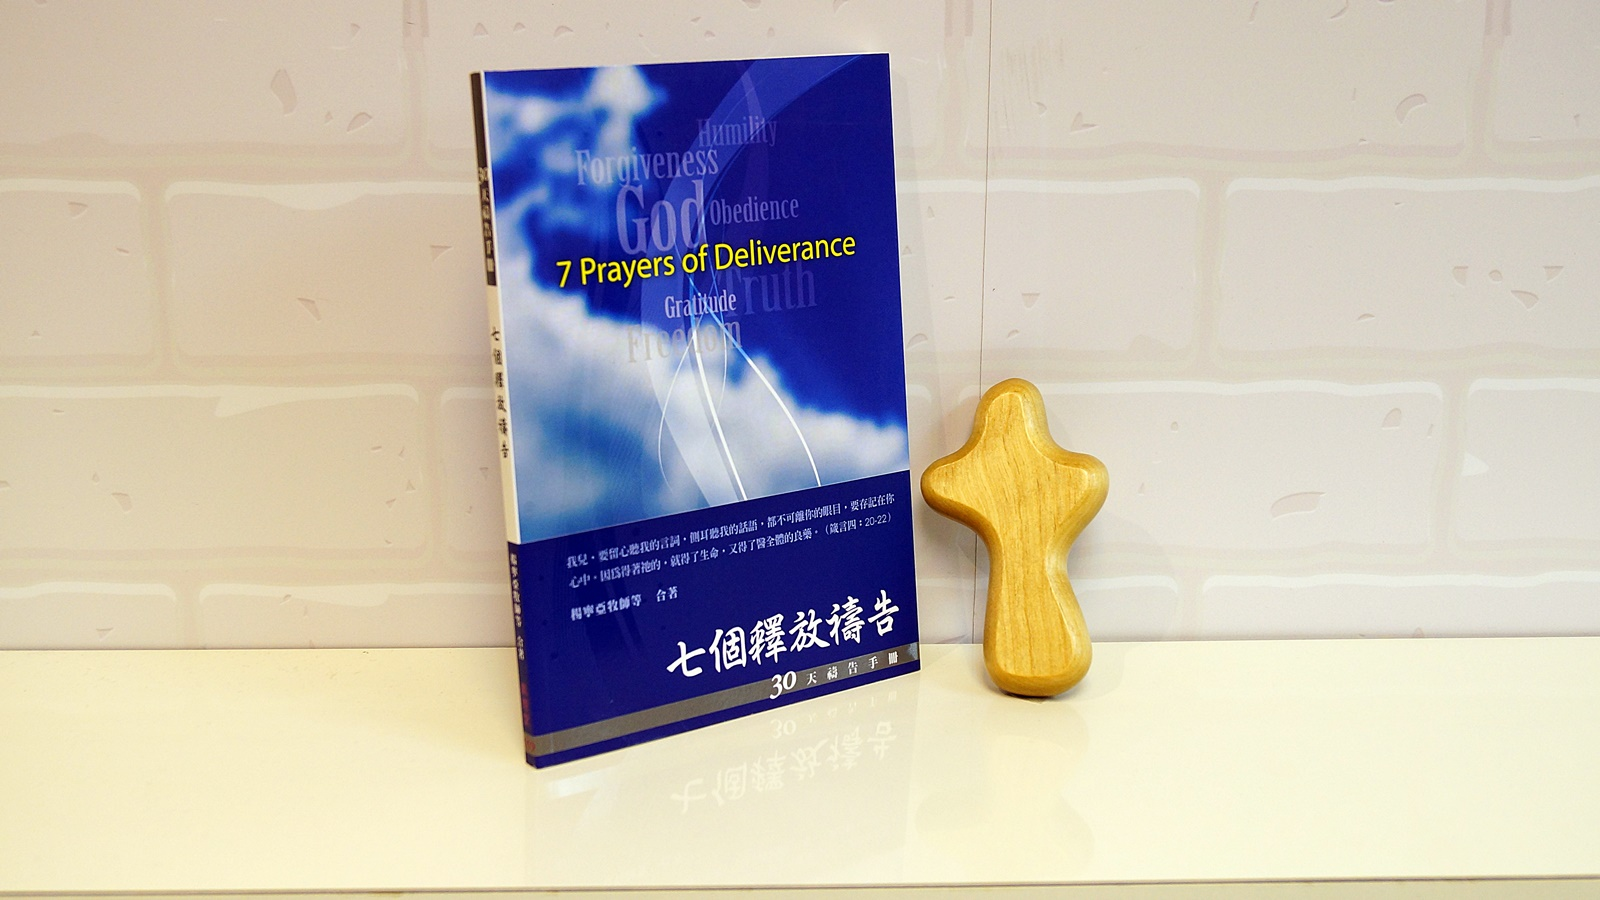 7-Prayers-of-Deliverance